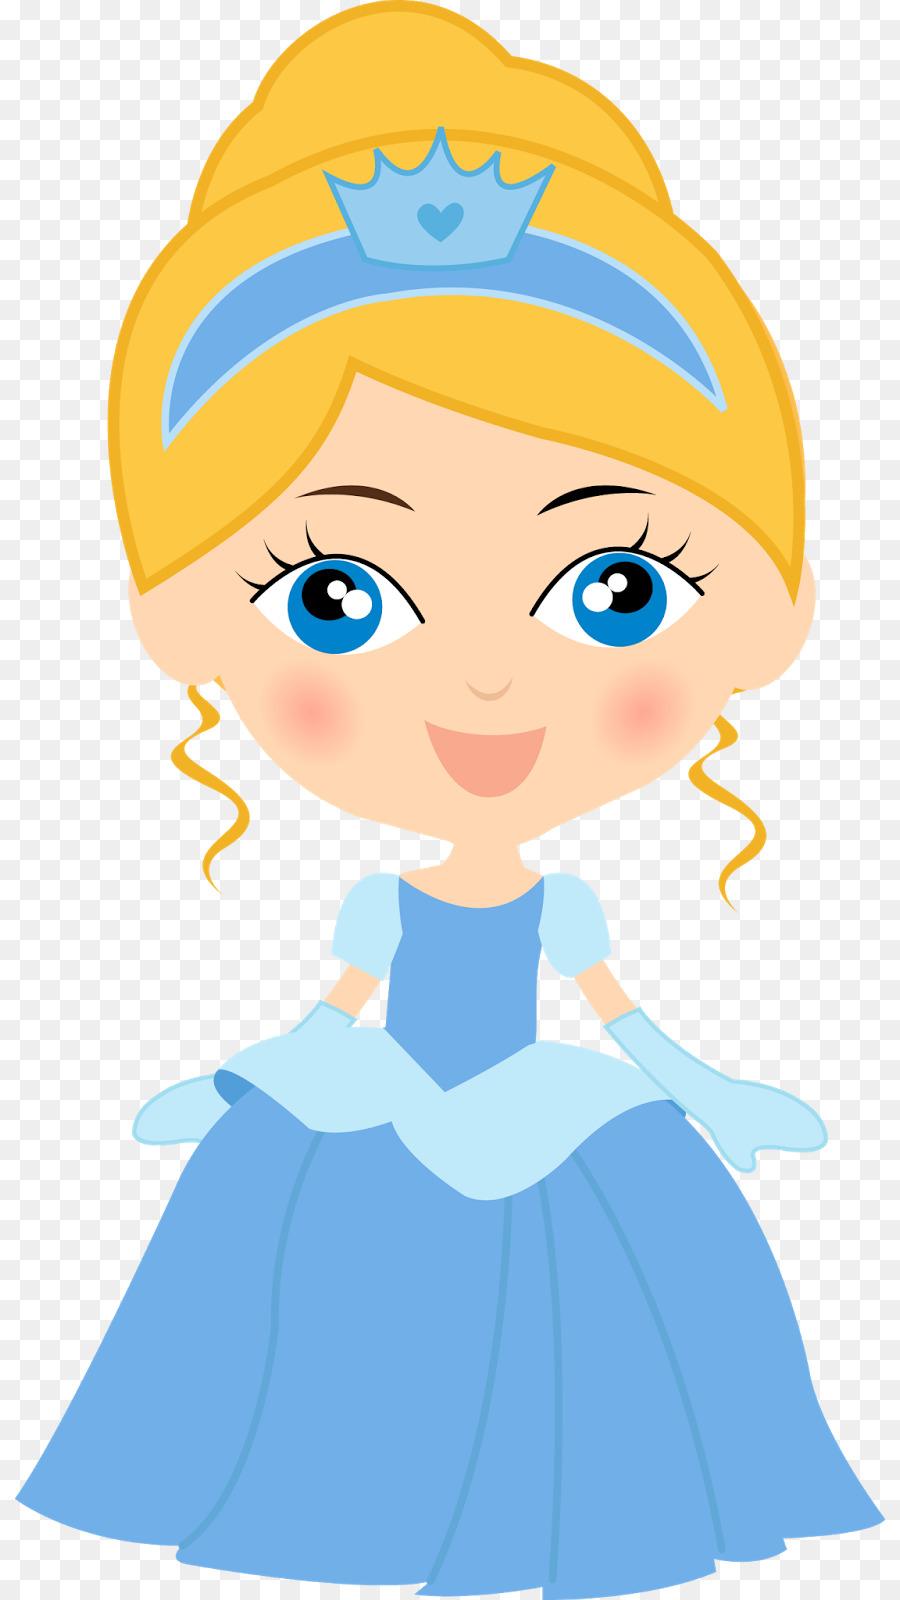 A Cinderella Princesa de Disney Clip art - Cenicienta png dibujo ...